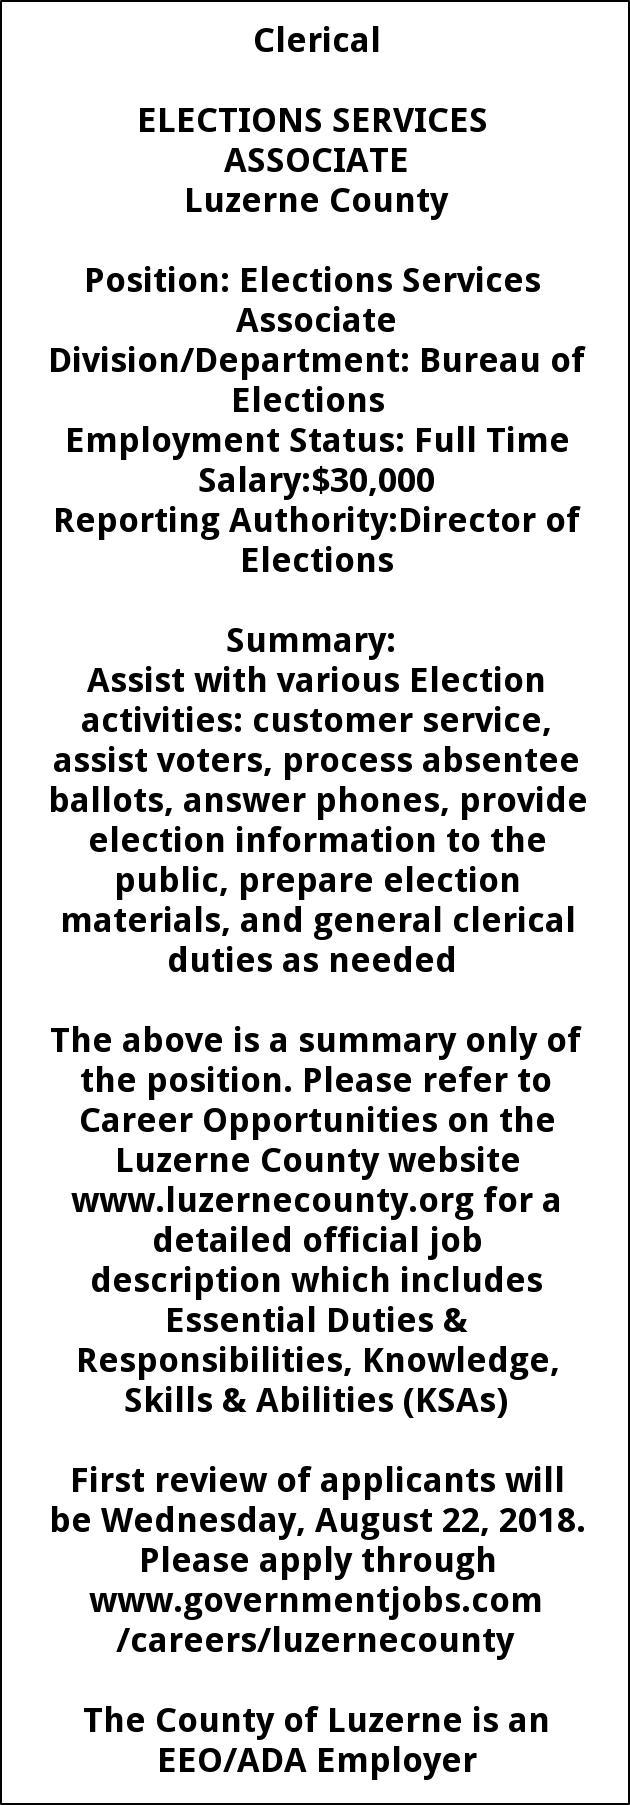 Elections Service Associates